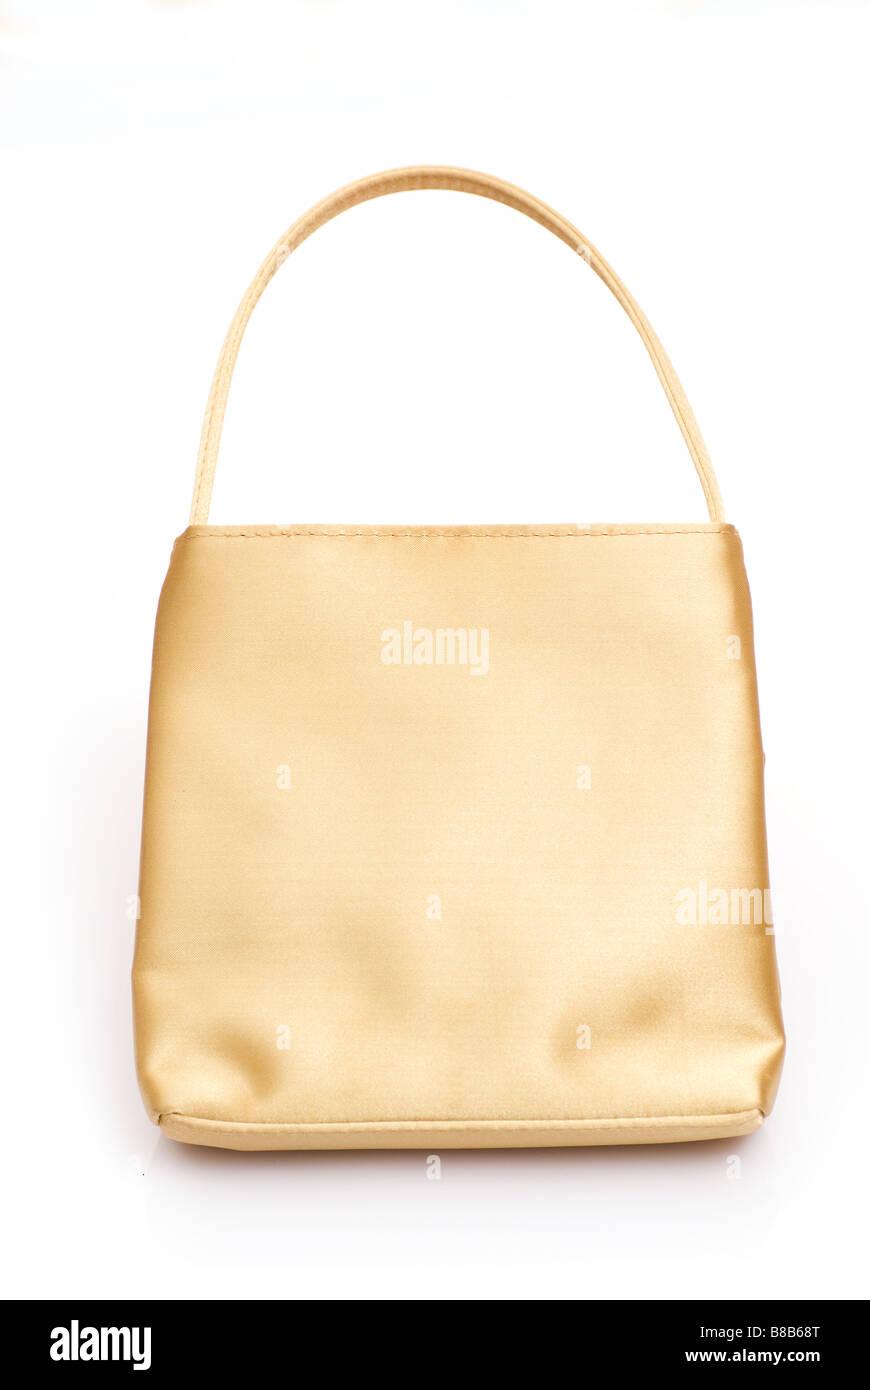 28bfc9b7 Handbag Handbags Stock Photos & Handbag Handbags Stock Images - Alamy